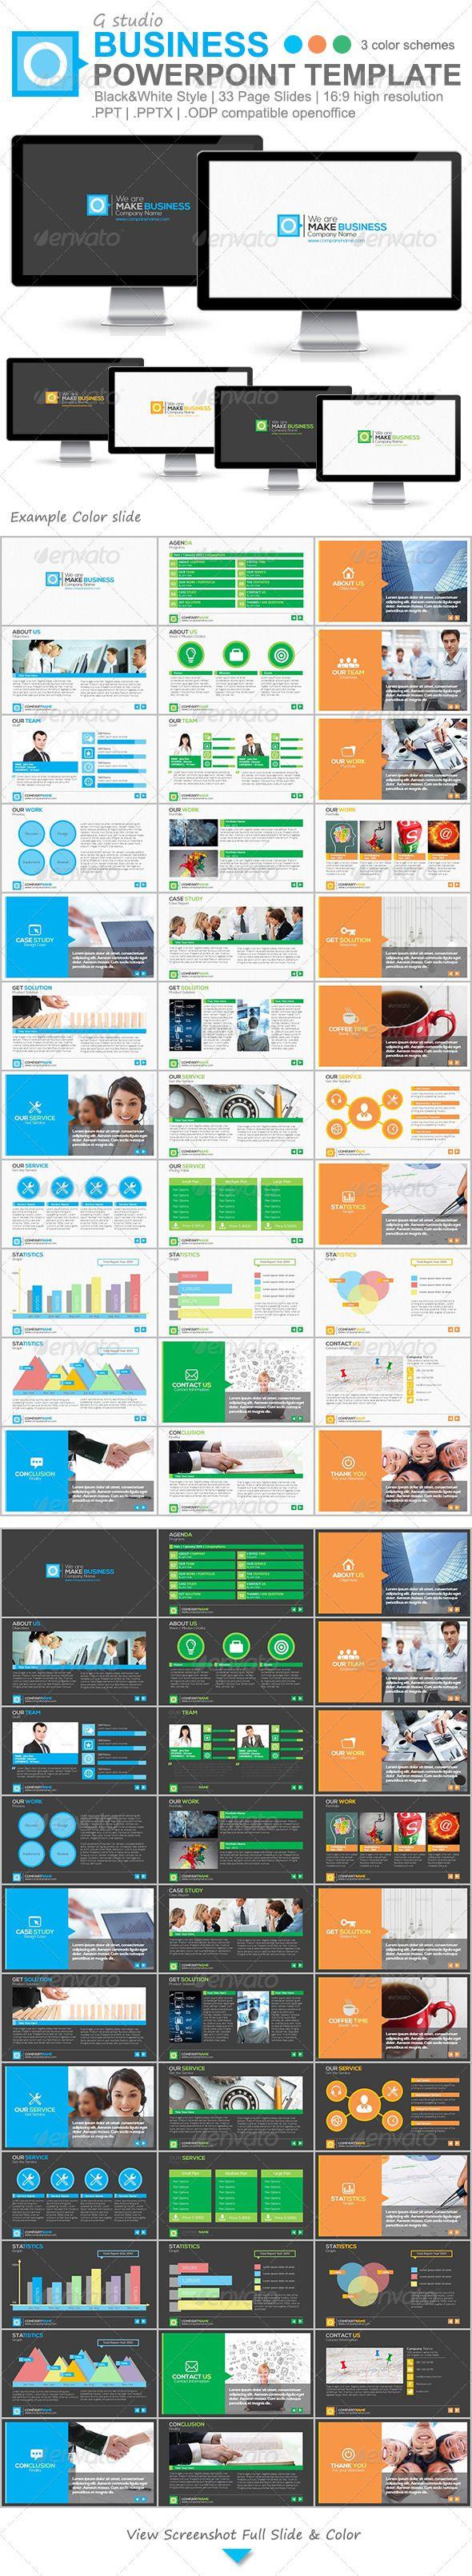 Gstudio Business Powerpoint Template - Business Powerpoint Templates